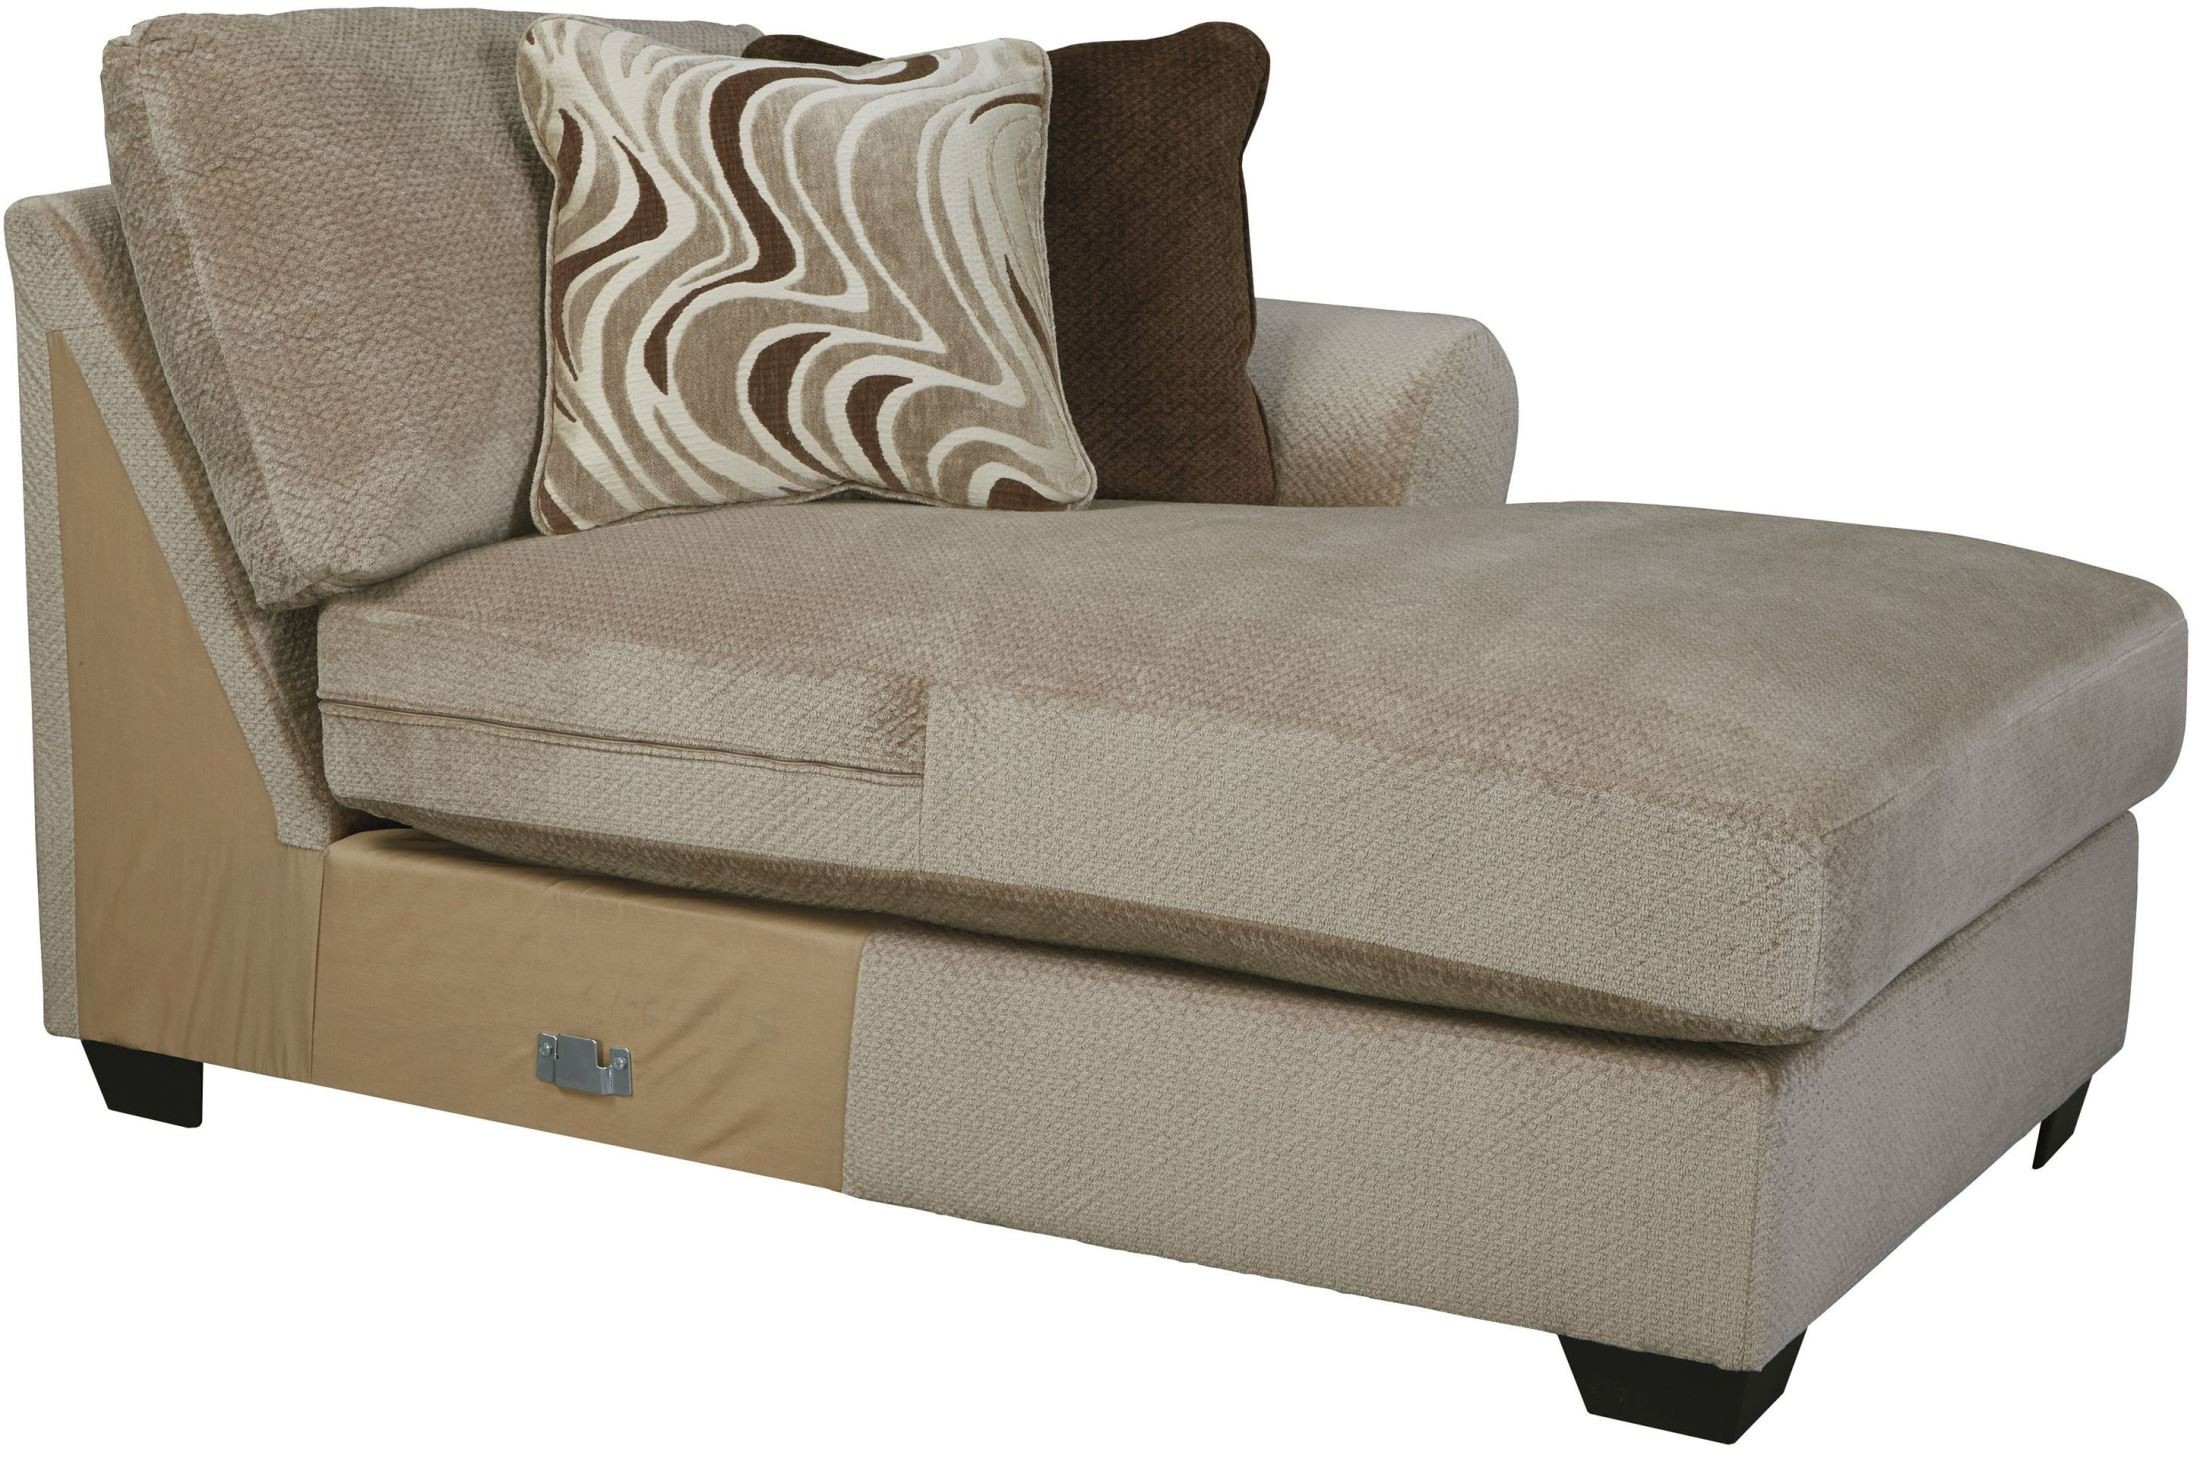 Hazes Fleece LAF Sofa Sectional from Ashley